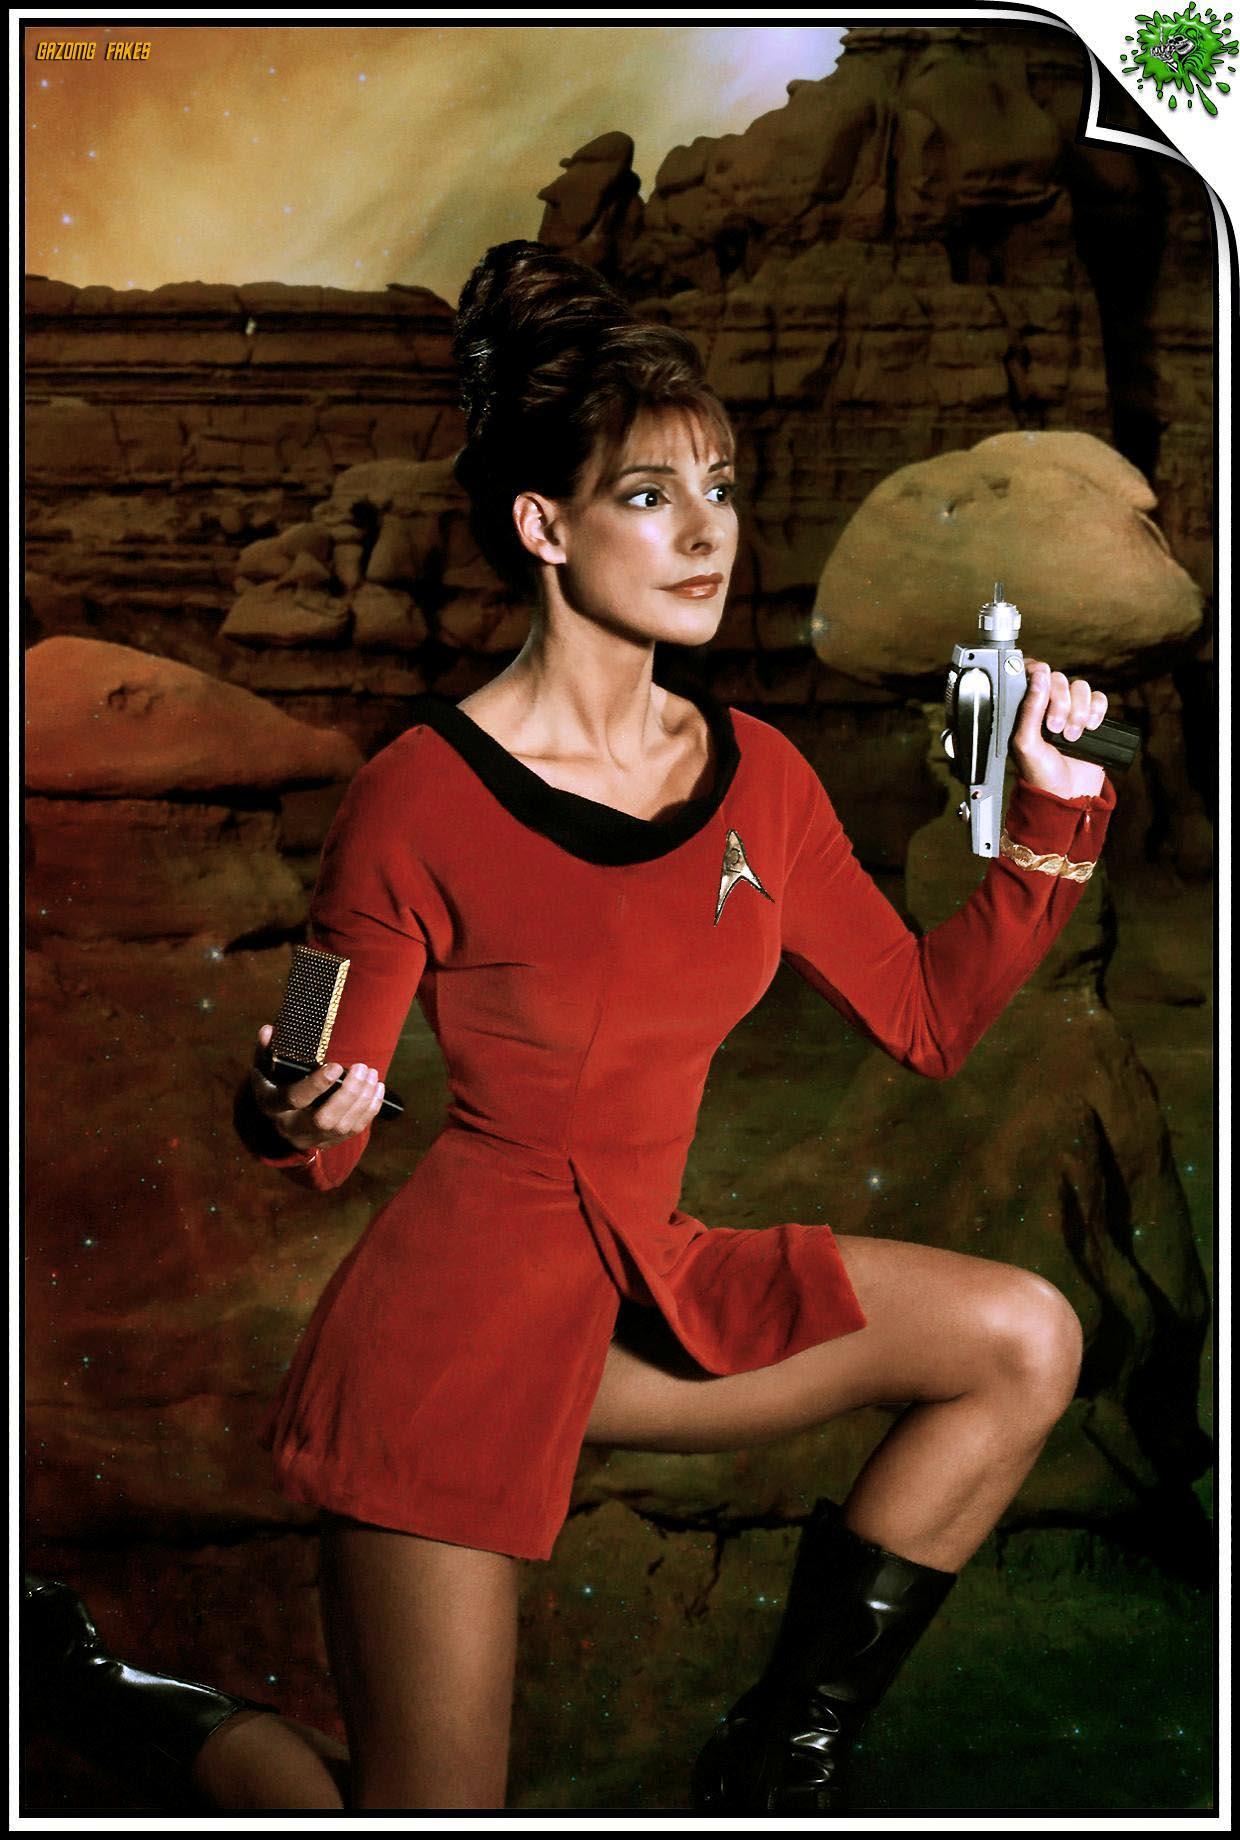 Deanna Troi Marina Sirtis by gazomg on DeviantArt